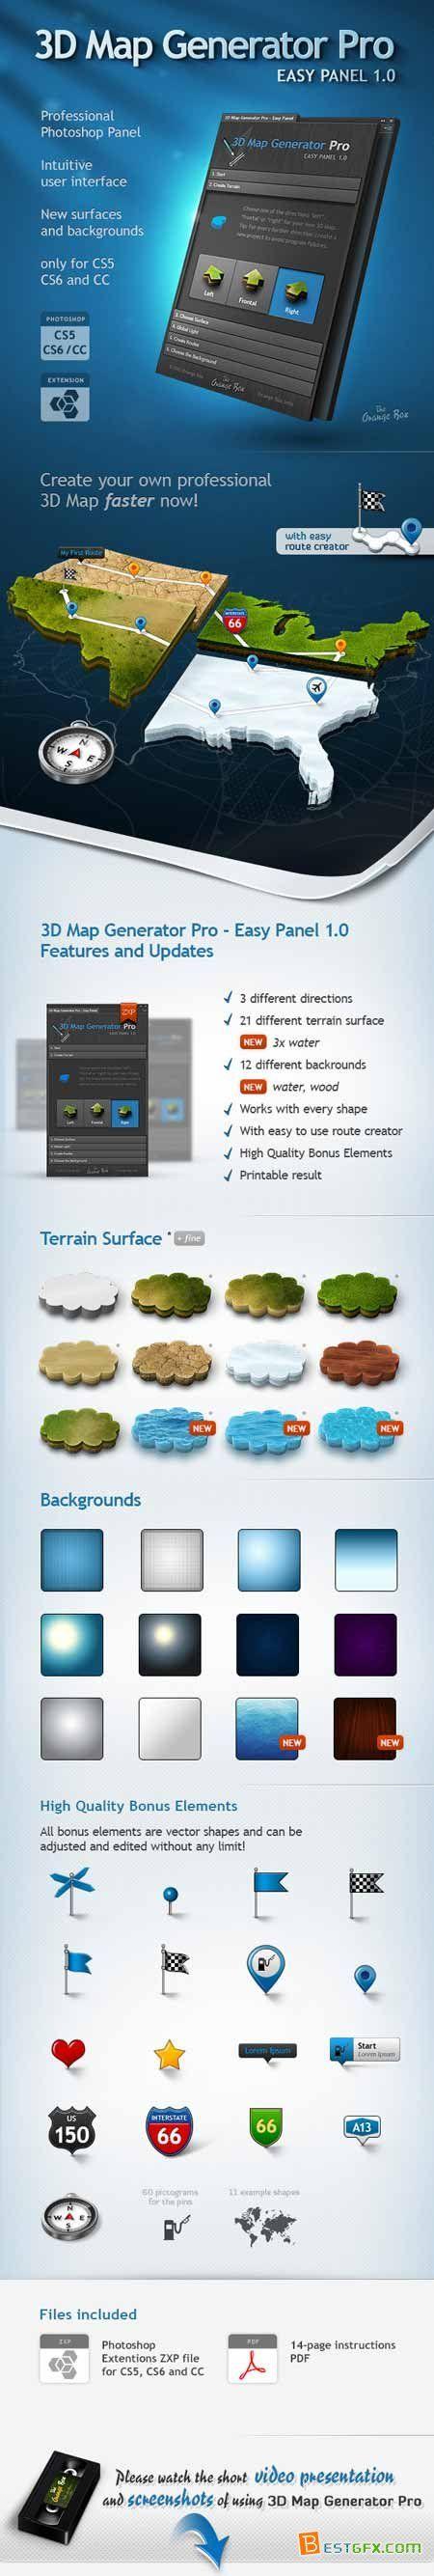 3D Map Generator Pro - Easy Panel 3540744